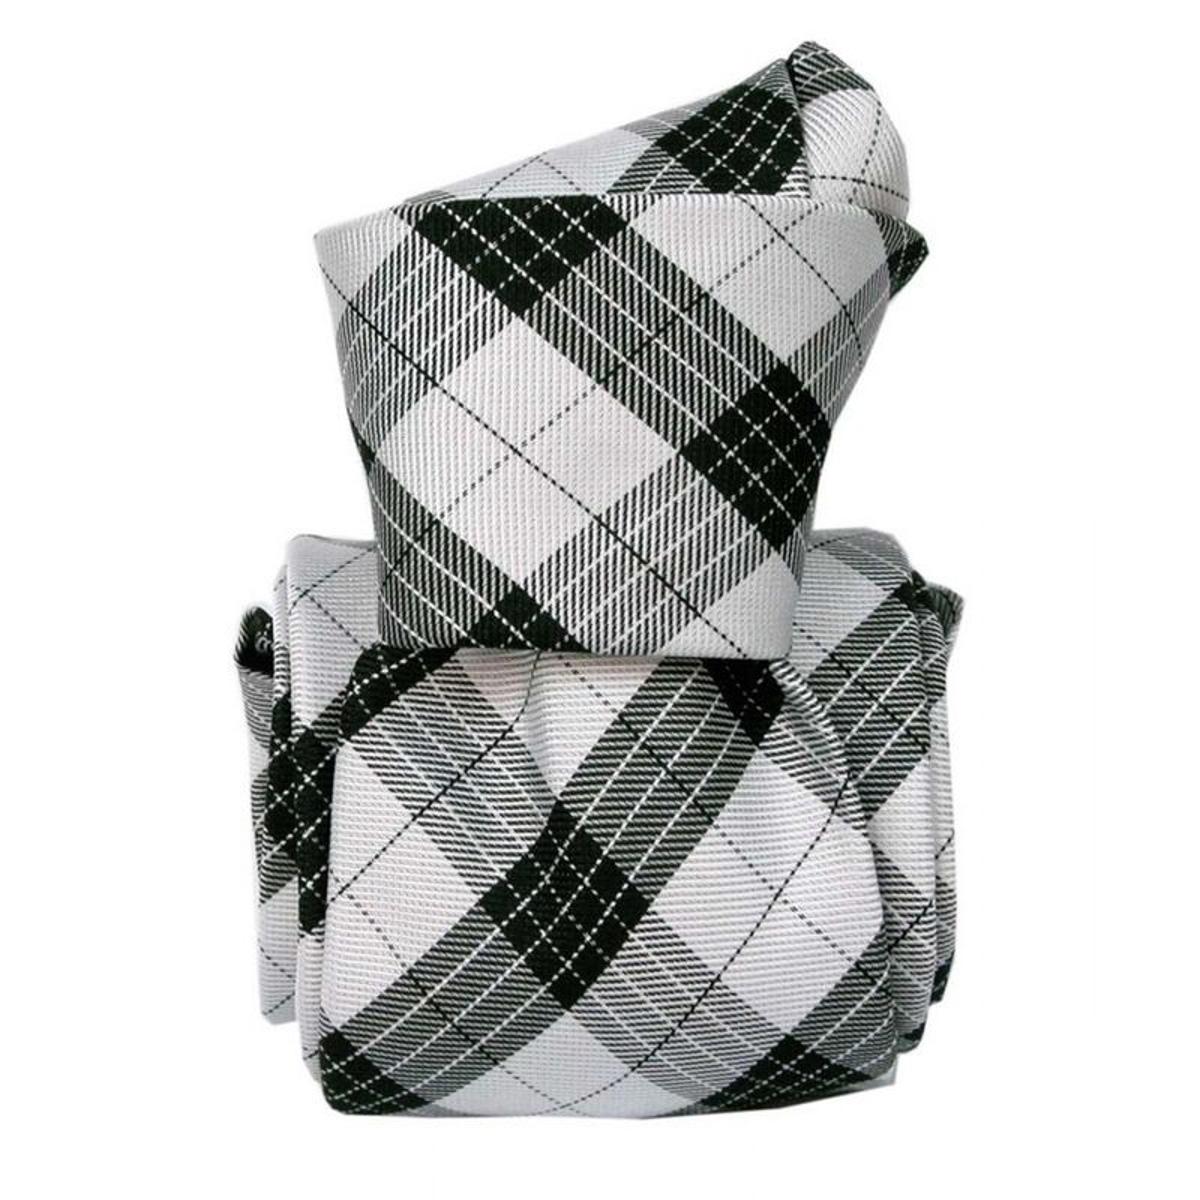 Cravate classique soie wexford